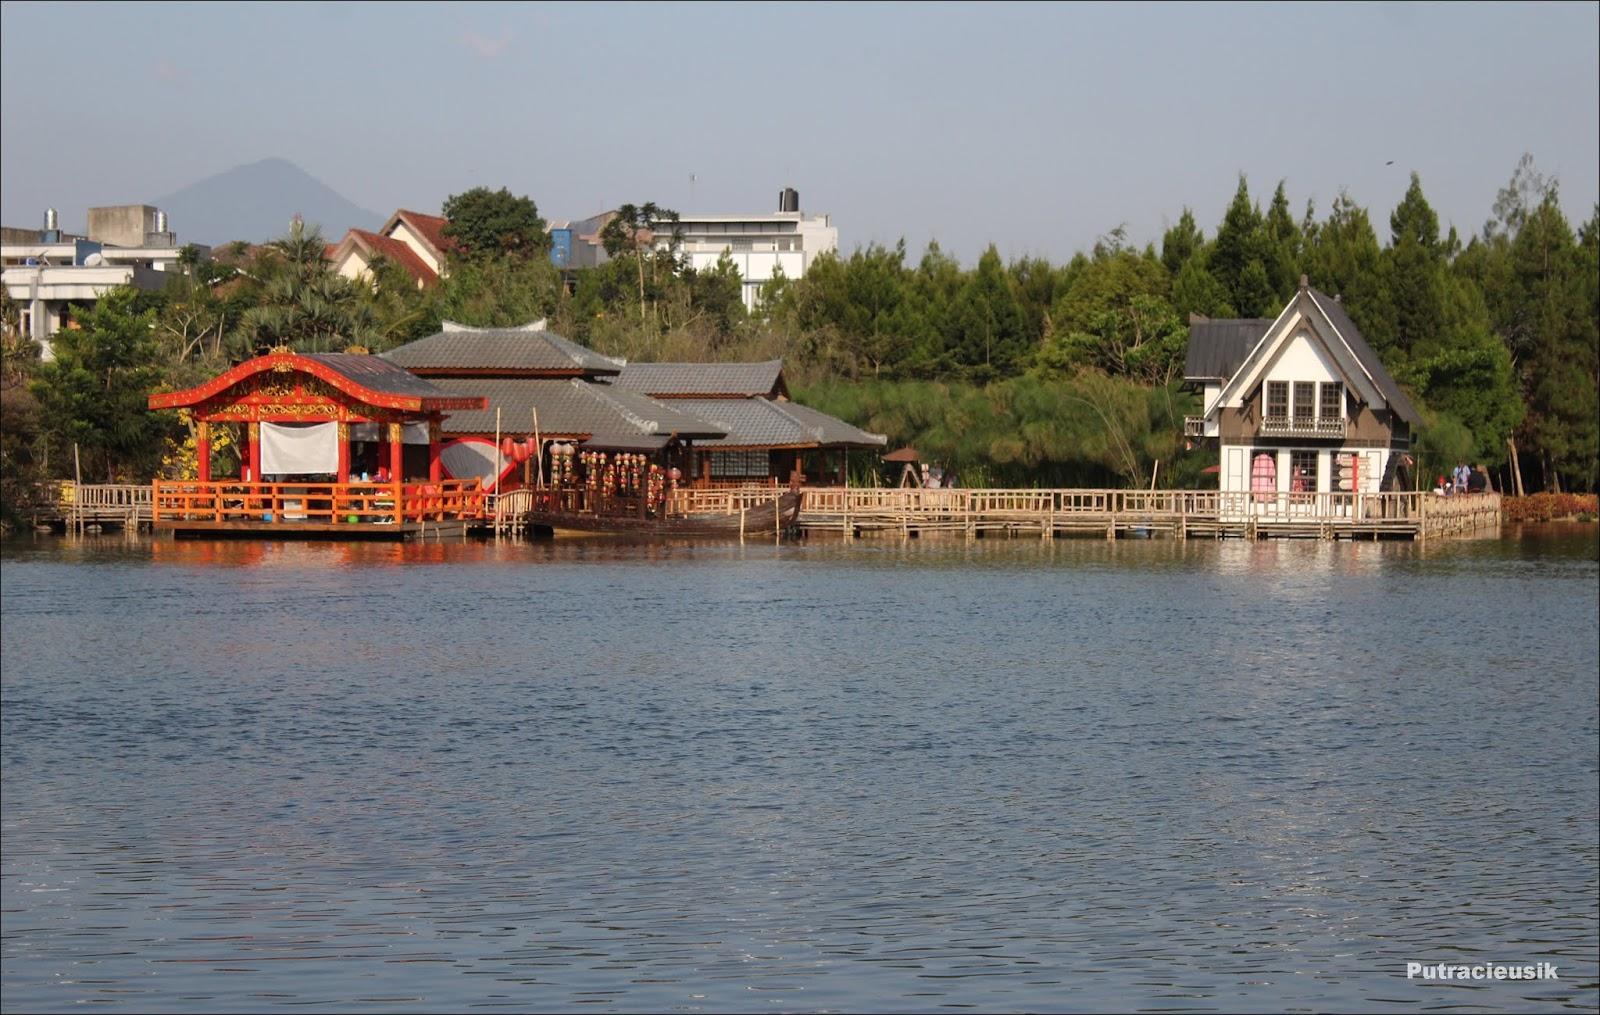 Objek Wisata Floating Market Lembang